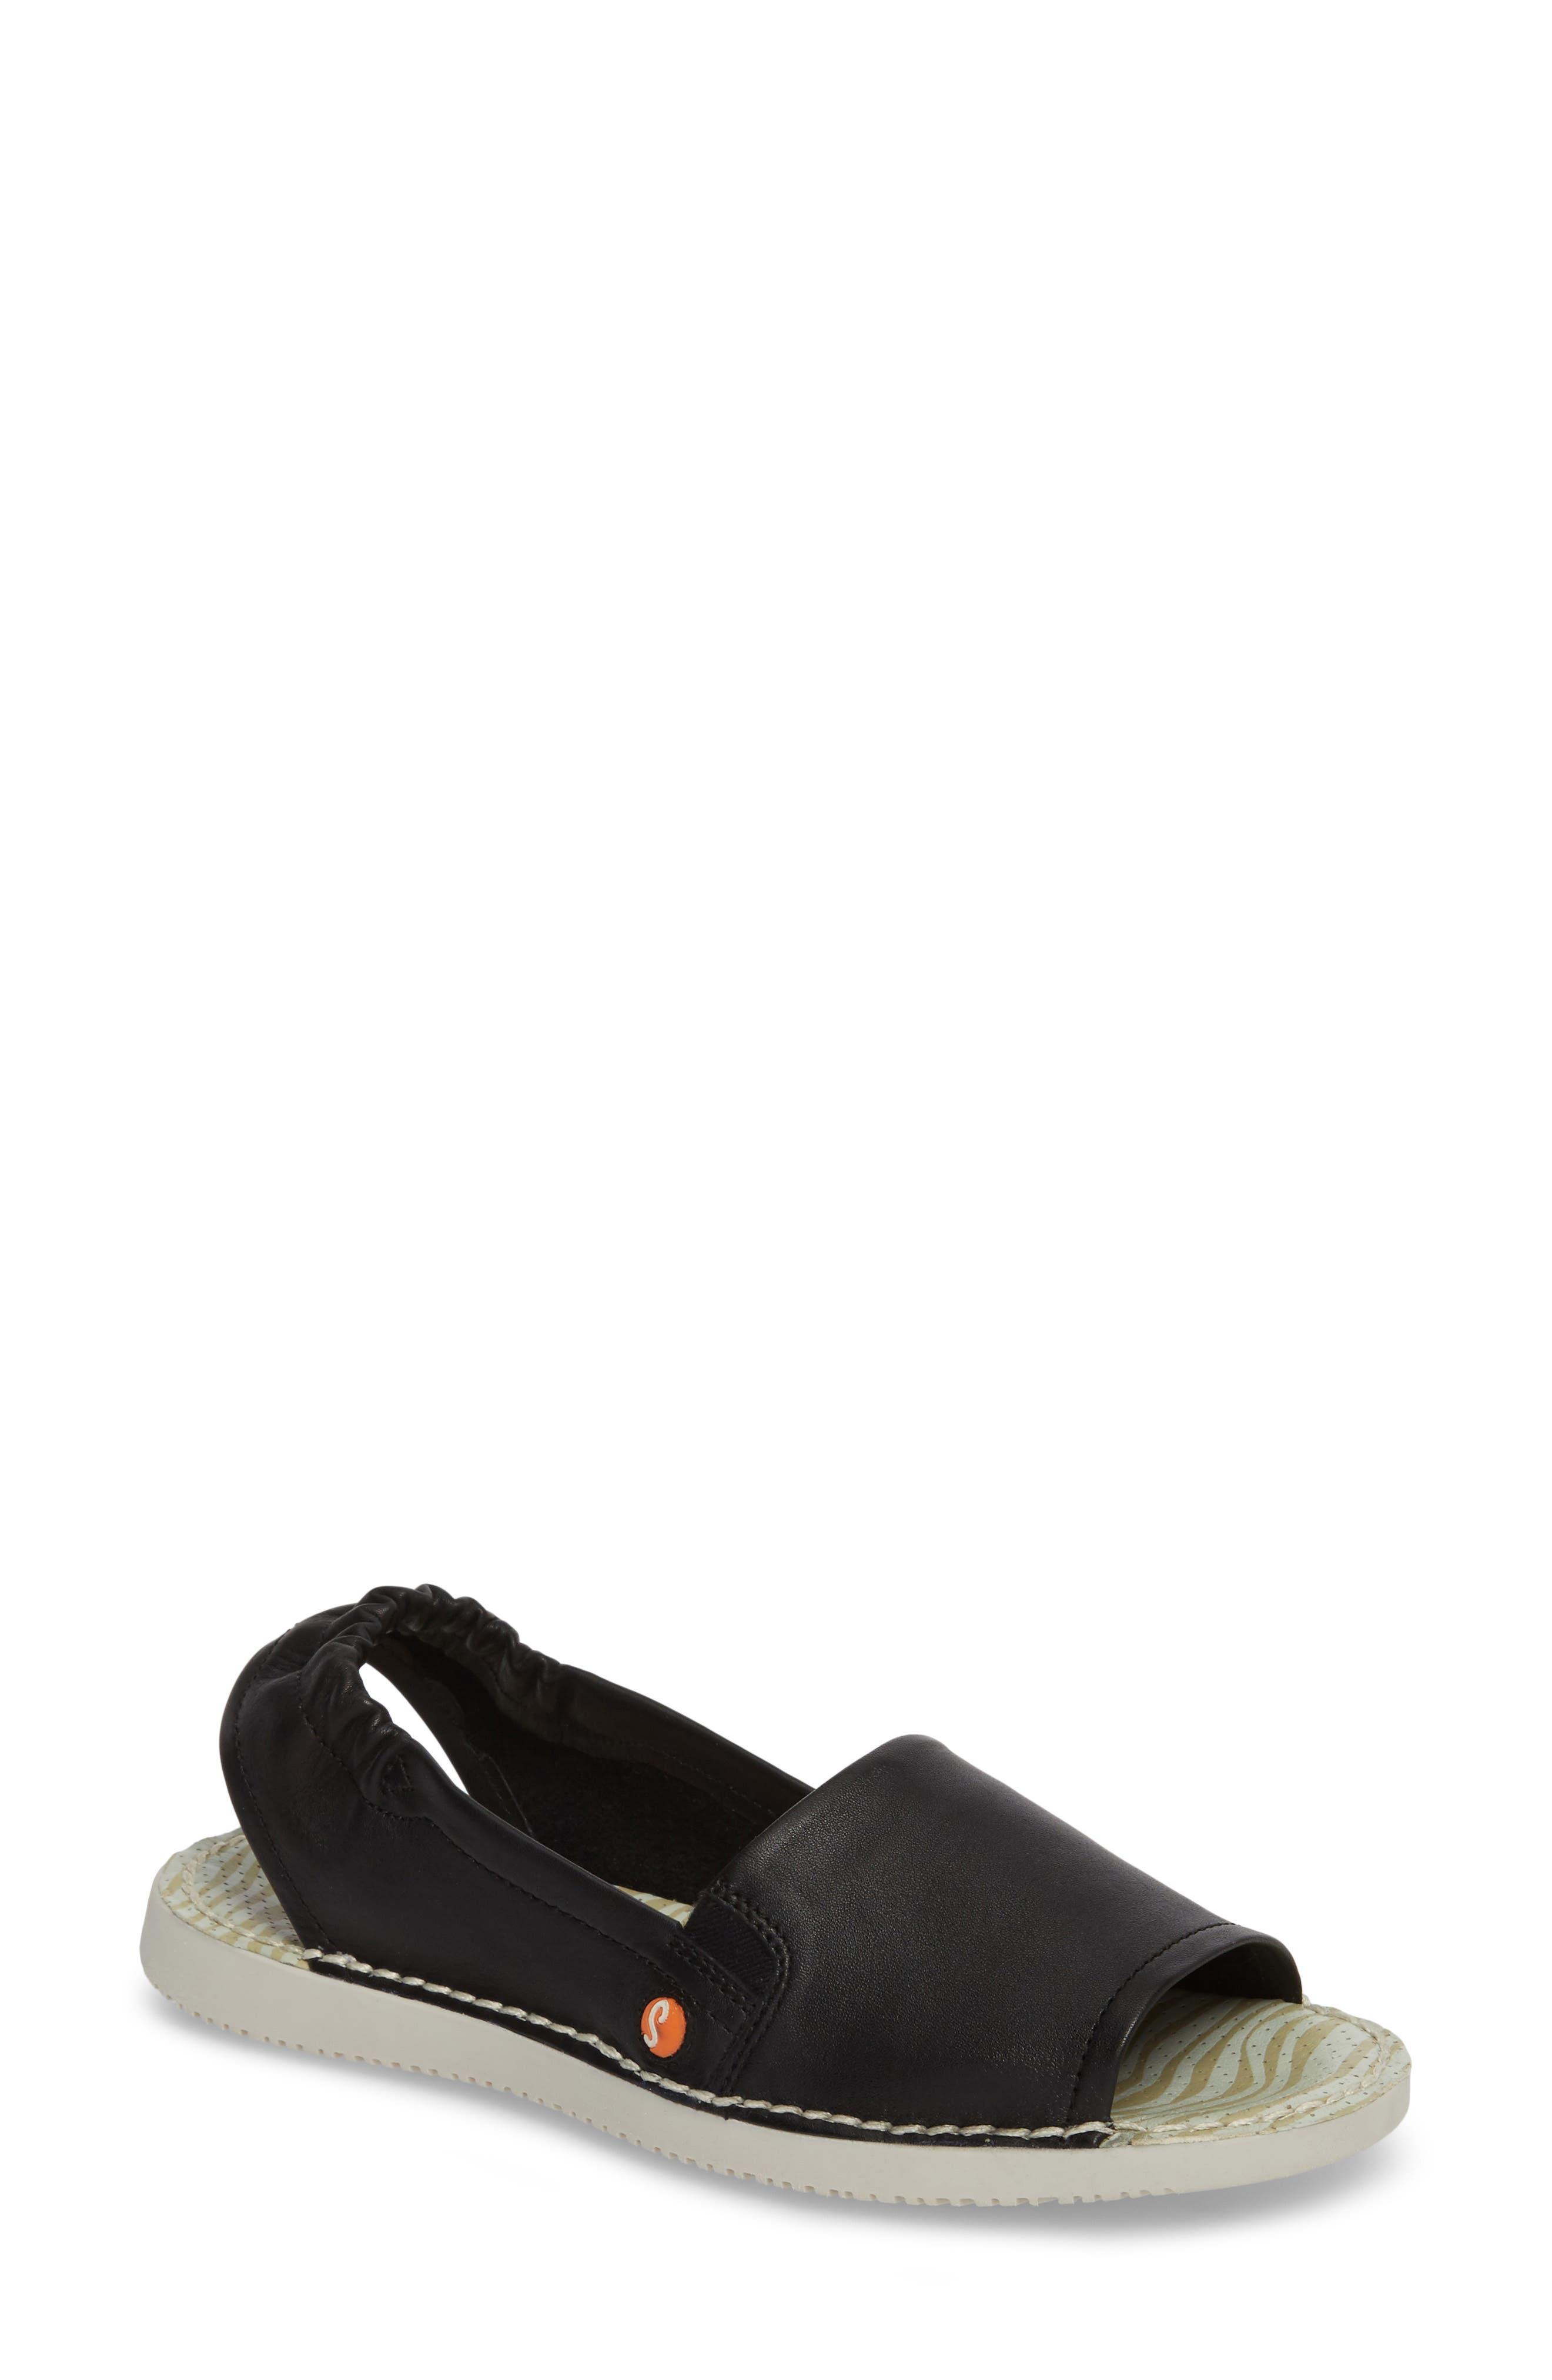 Tee Flat Sandal,                         Main,                         color, BLACK LEATHER